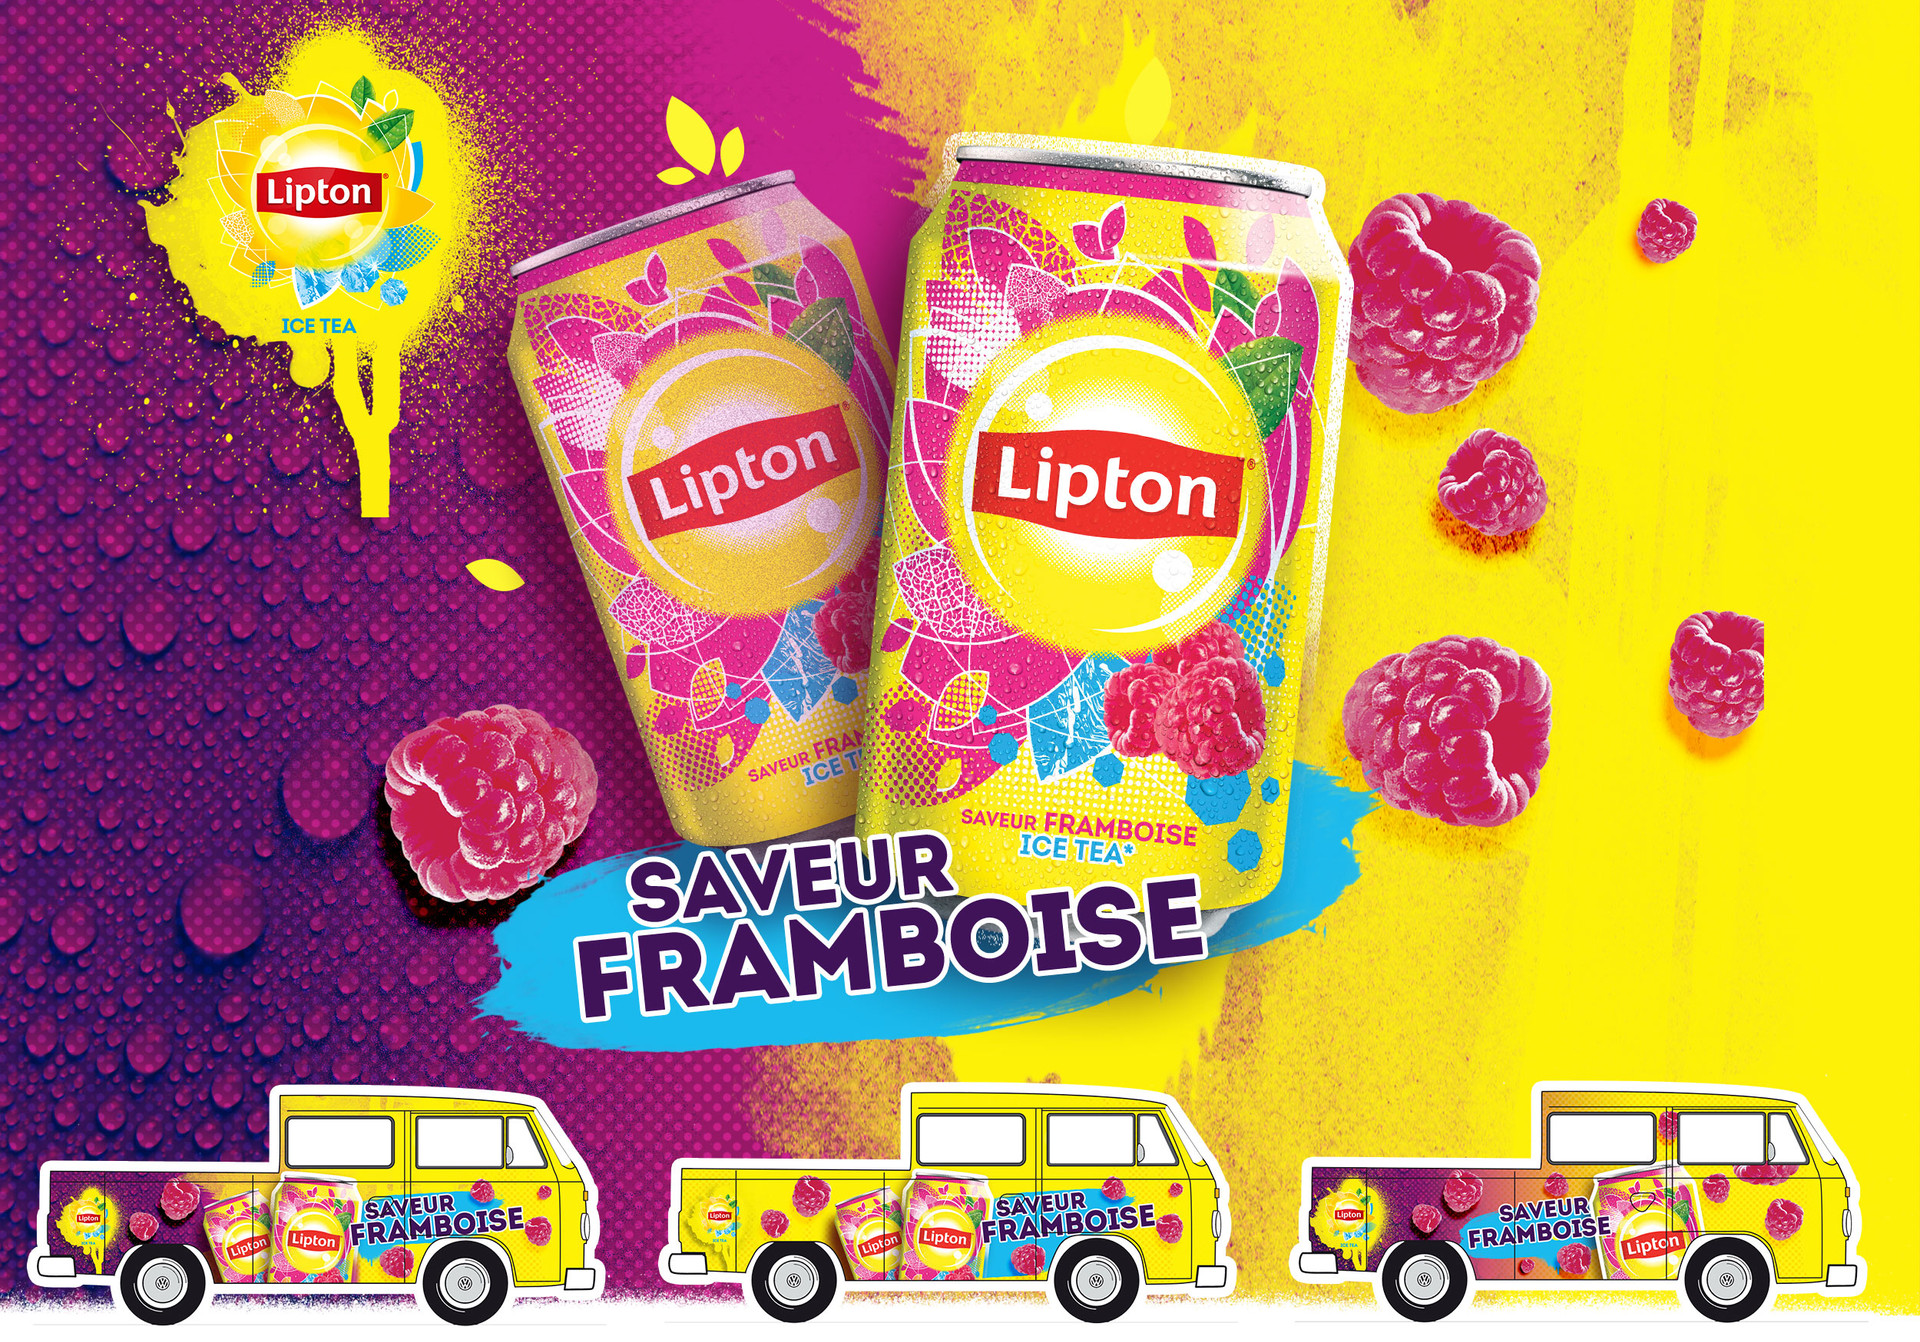 Lipton3.jpg